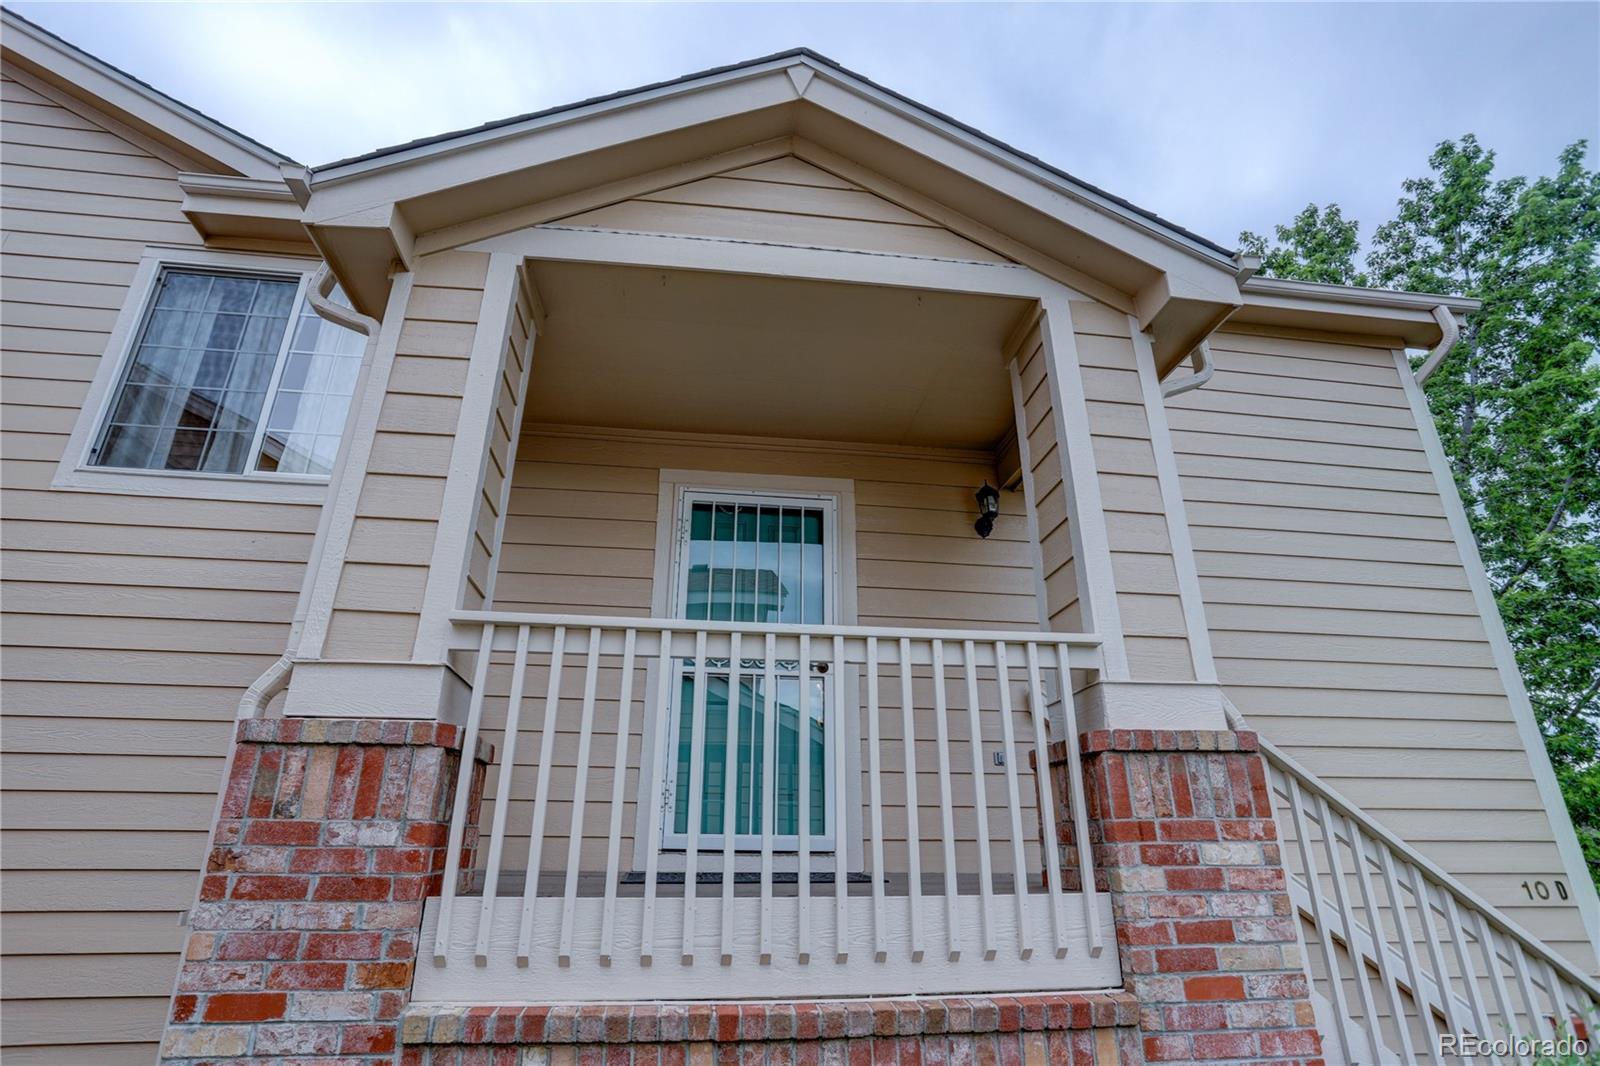 MLS# 2836182 - 3 - 7700 W Grant Ranch Boulevard #10D, Littleton, CO 80123